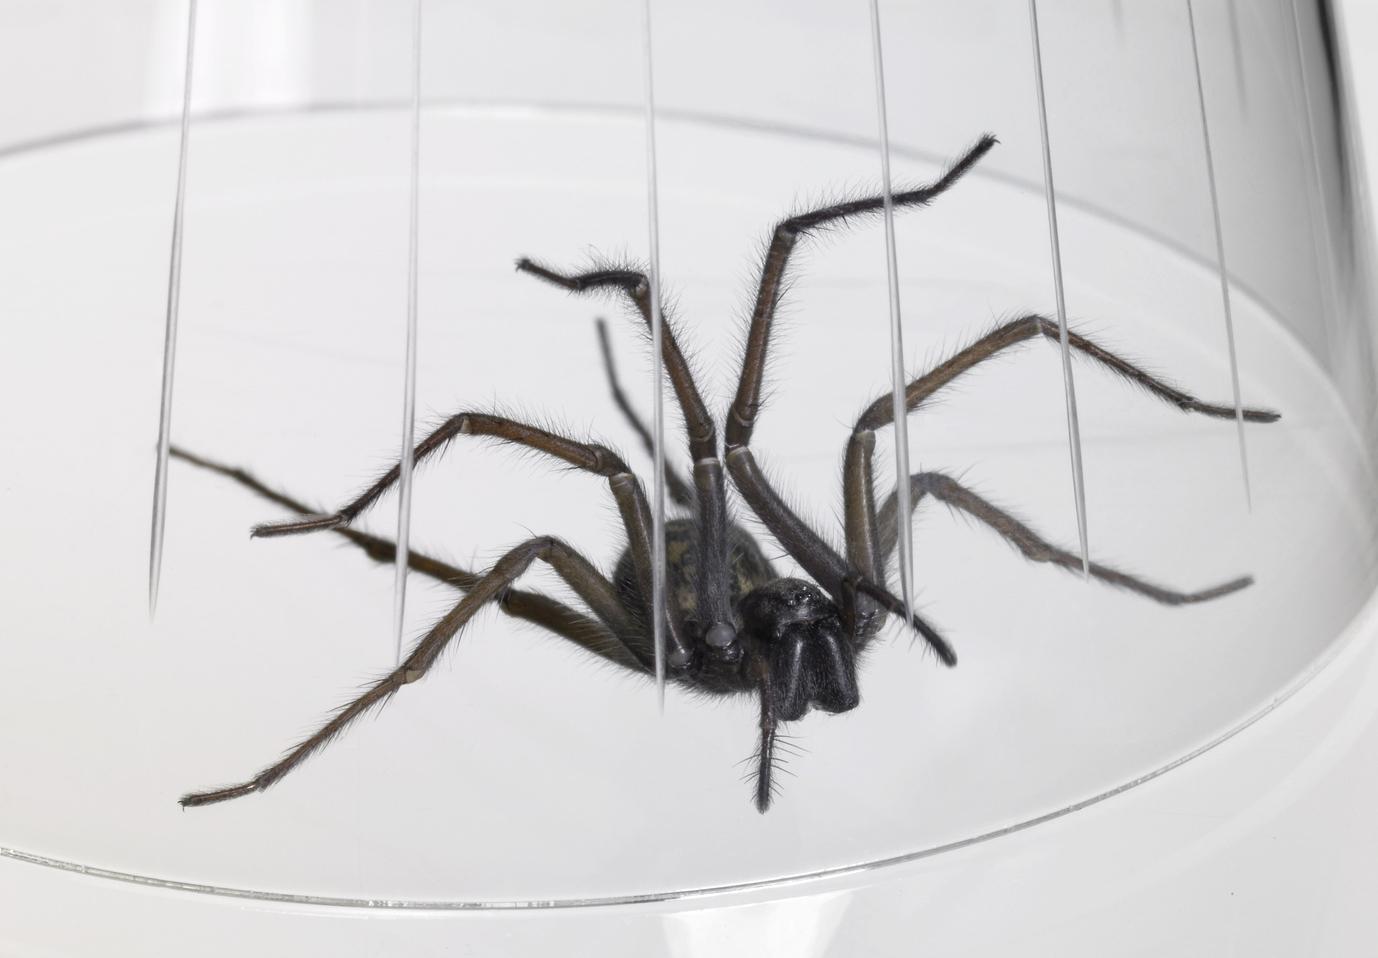 spinnenfalle selber machen lebendfalle f r spinnen. Black Bedroom Furniture Sets. Home Design Ideas